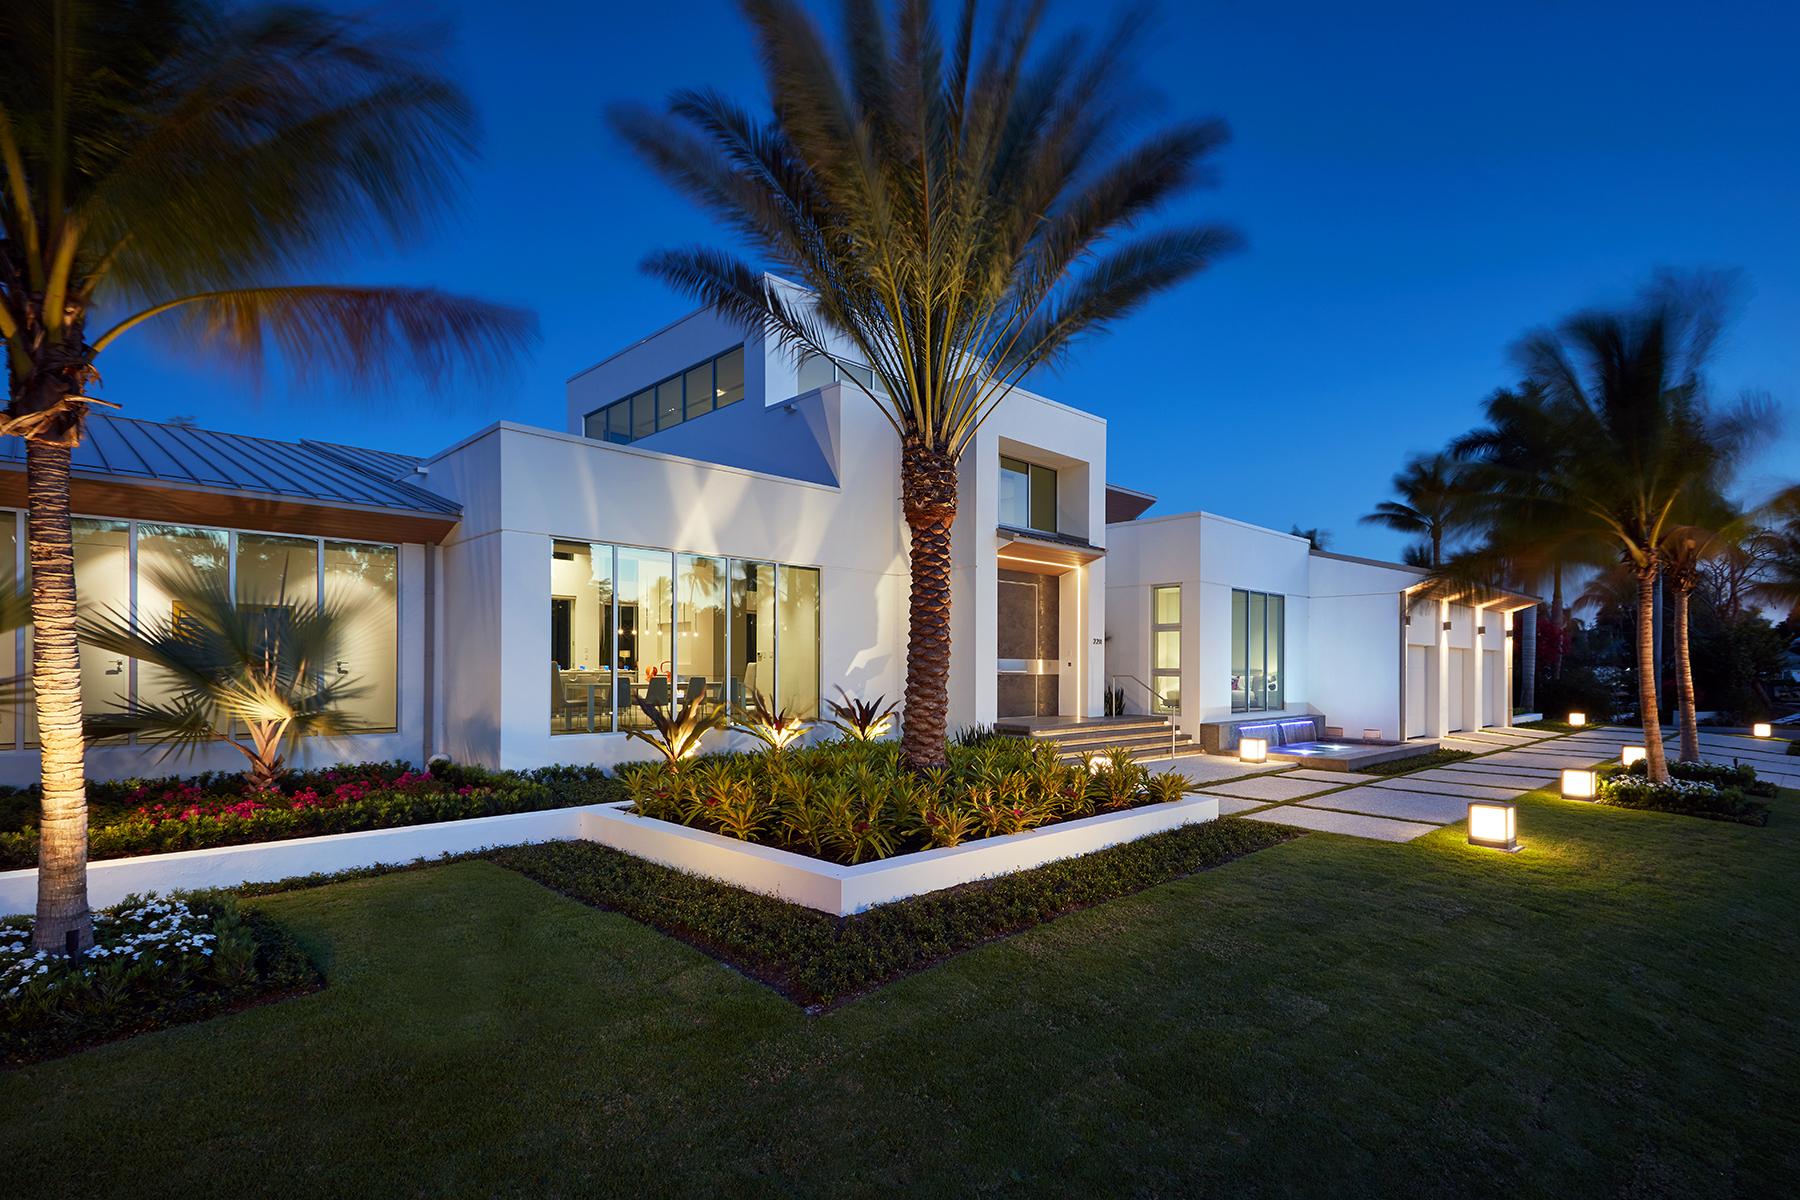 Tek Ailelik Ev için Satış at AQUALANE SHORES 2211 South Winds Dr Aqualane Shores, Naples, Florida, 34102 Amerika Birleşik Devletleri